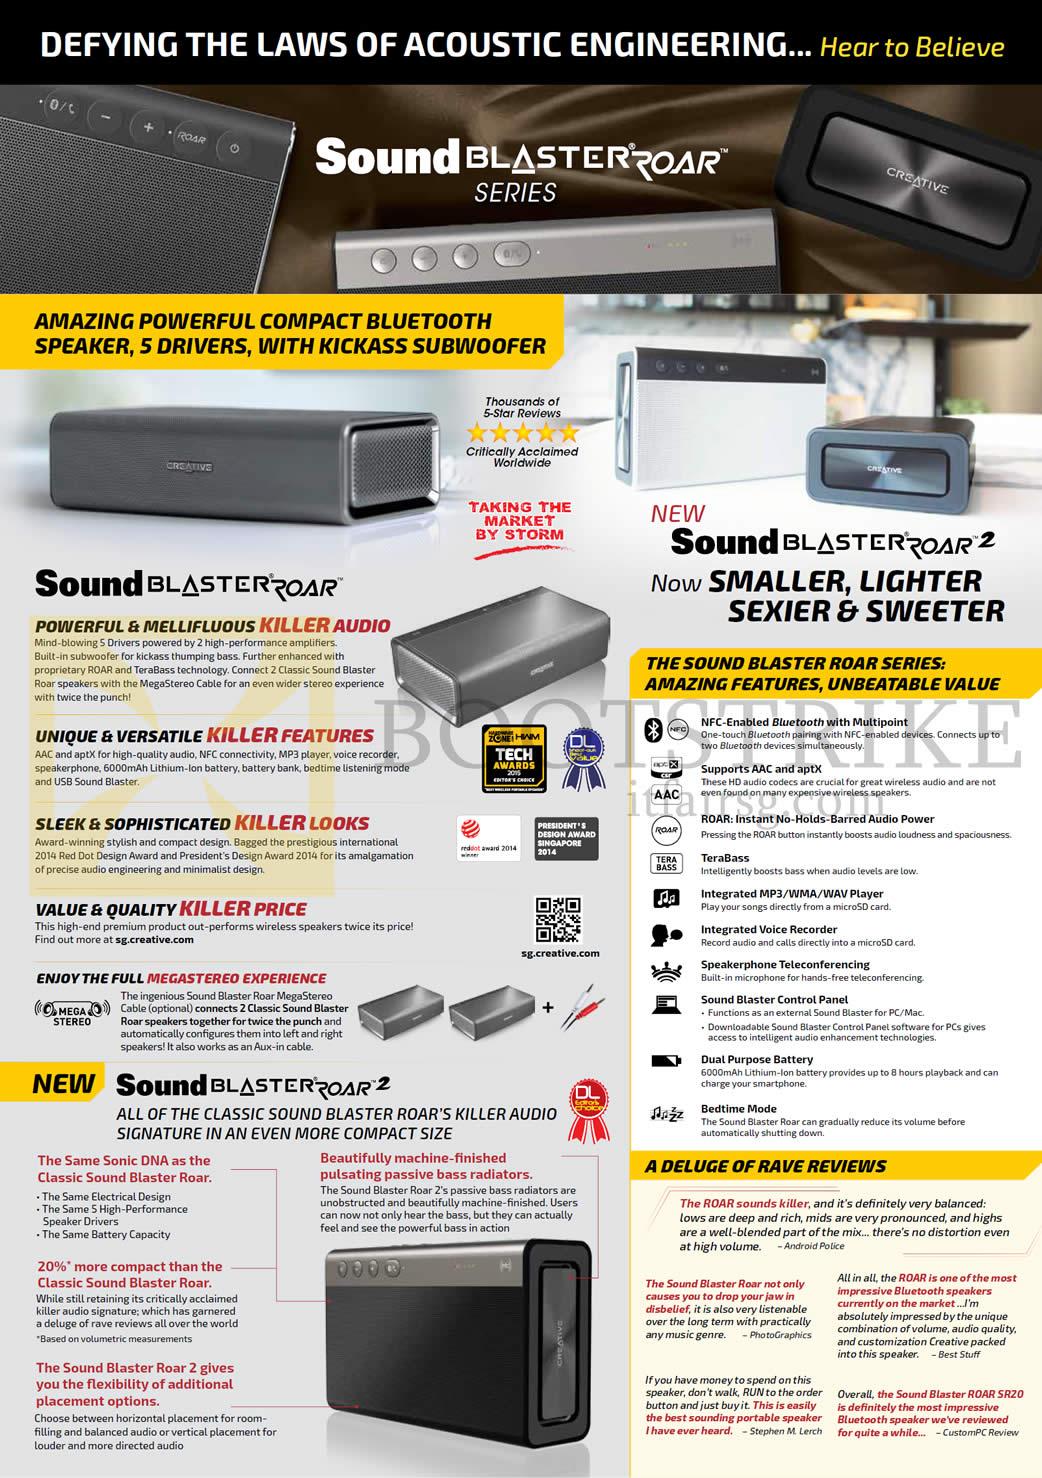 PC SHOW 2015 price list image brochure of Creative Sound Blaster Roar Series Wireless Speakers, Roar 2 Features